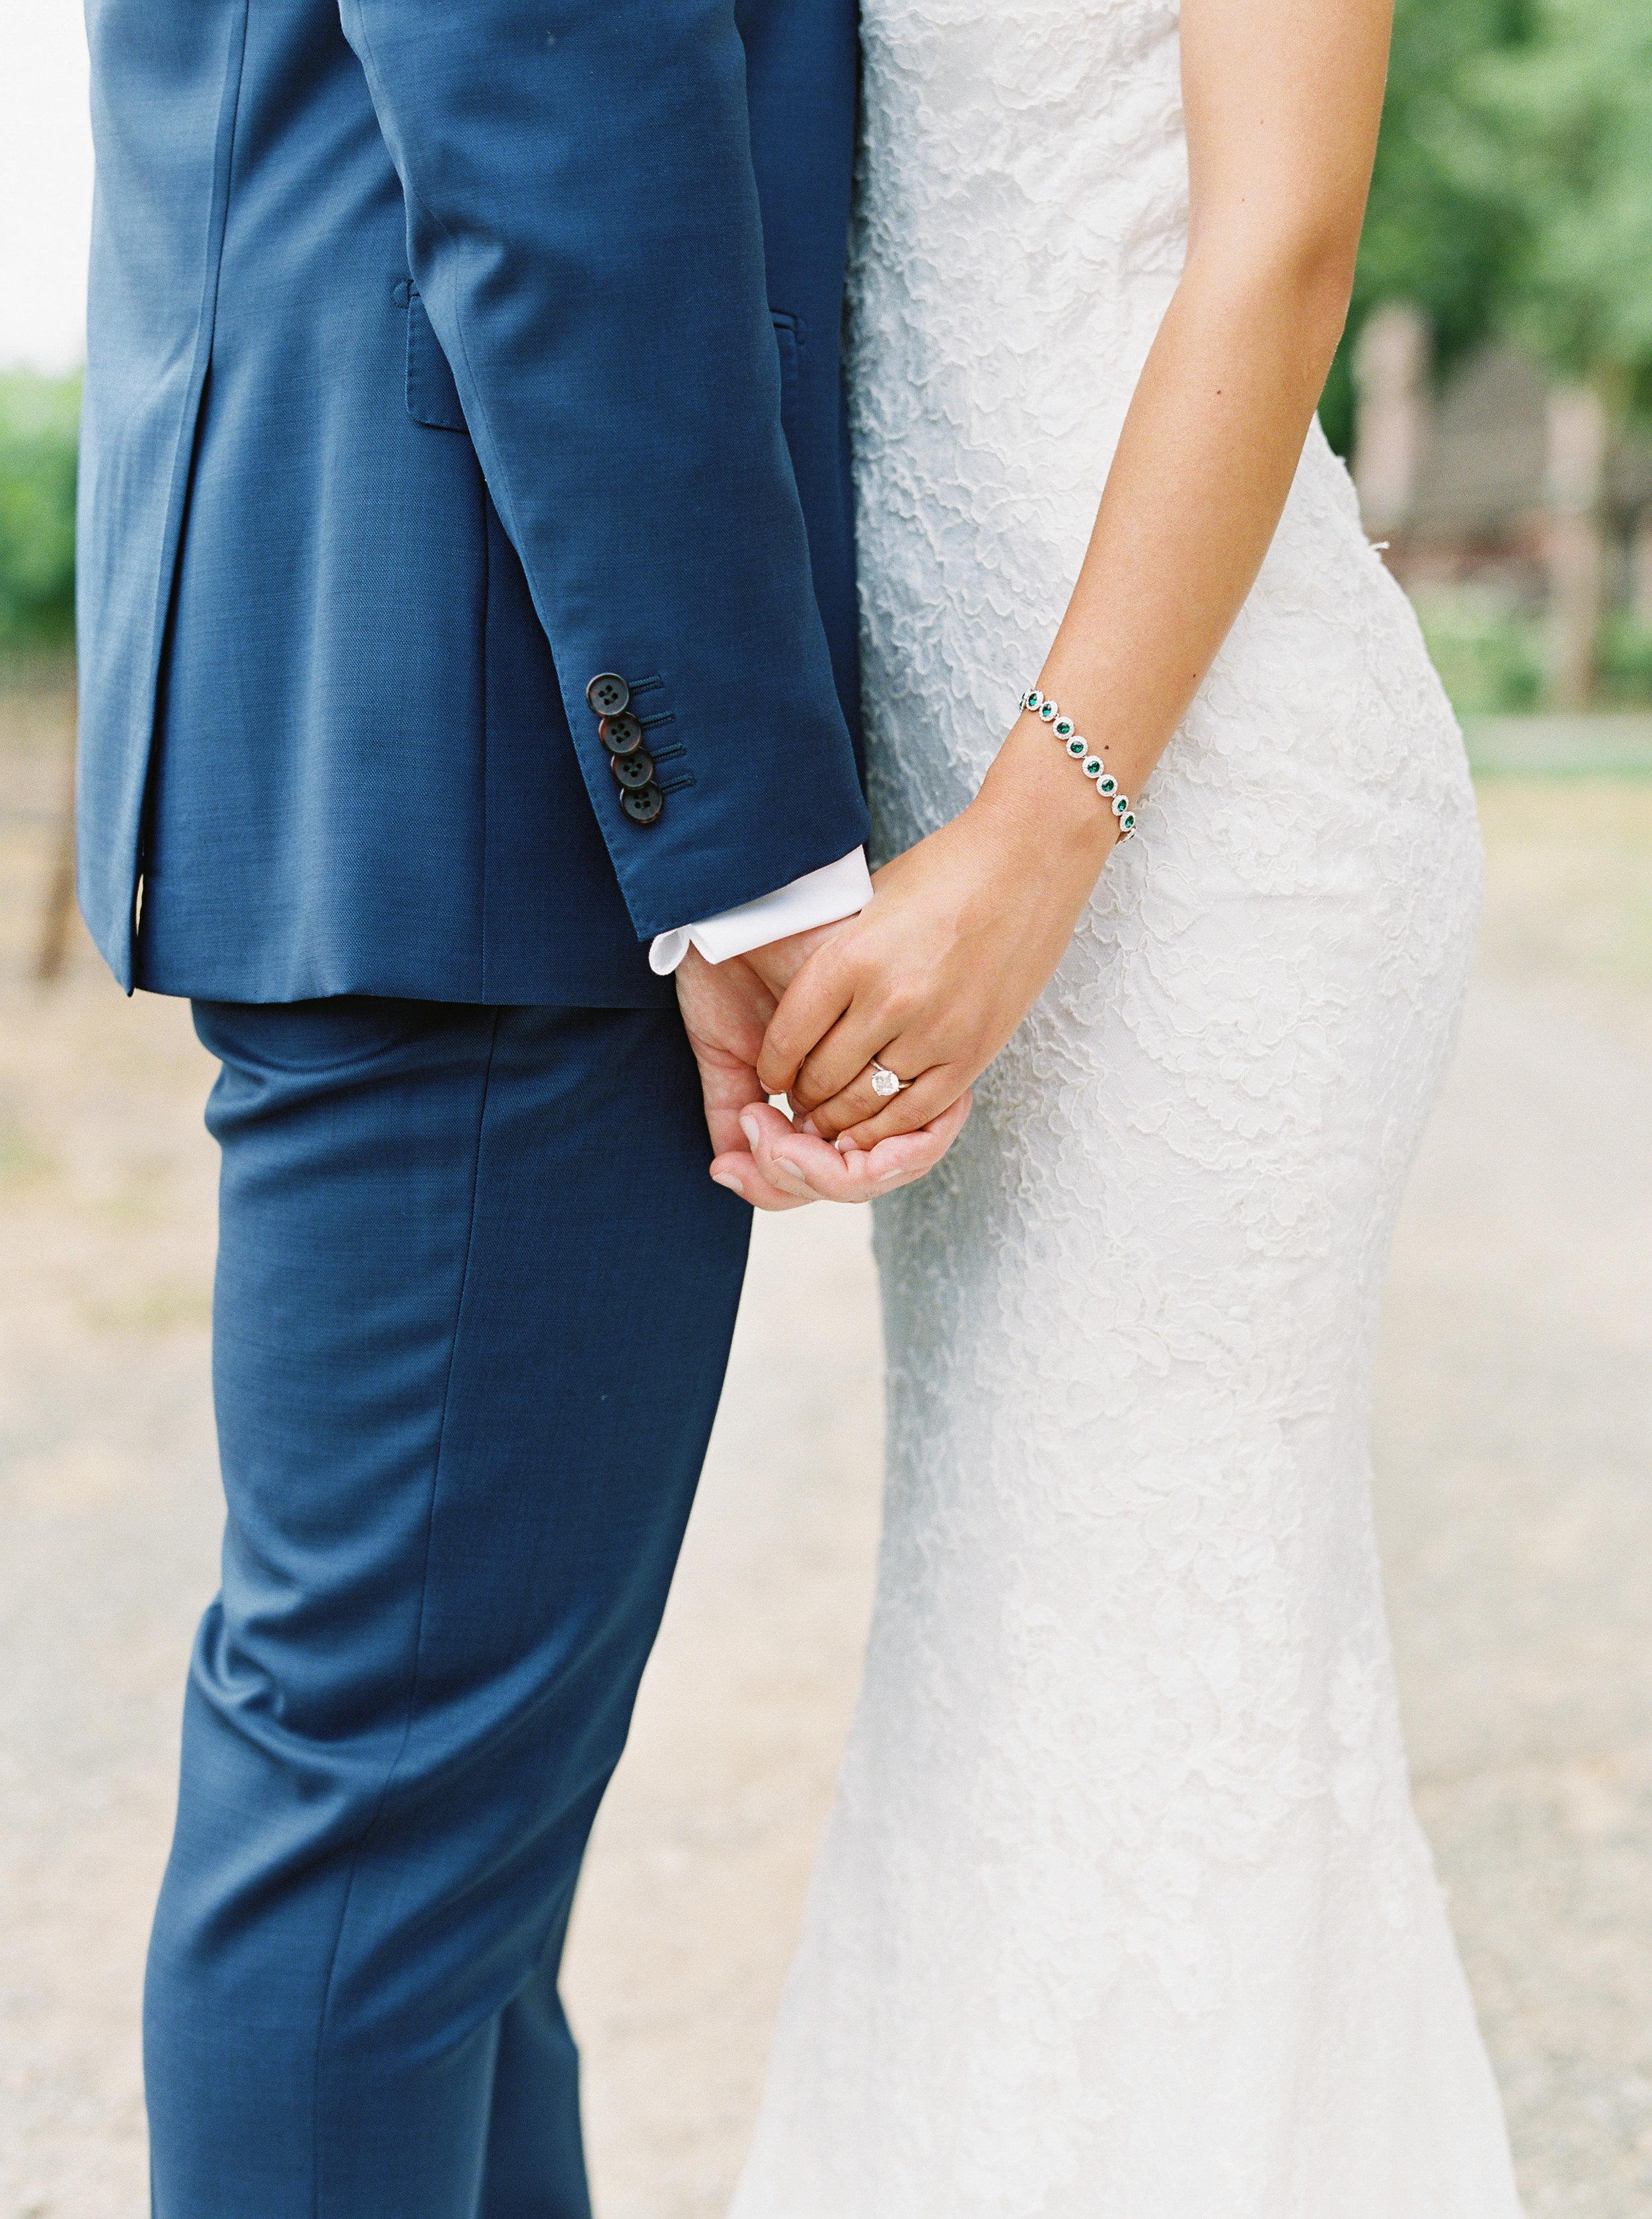 Harvest-inn-wedding-in-napa-california-239.jpg